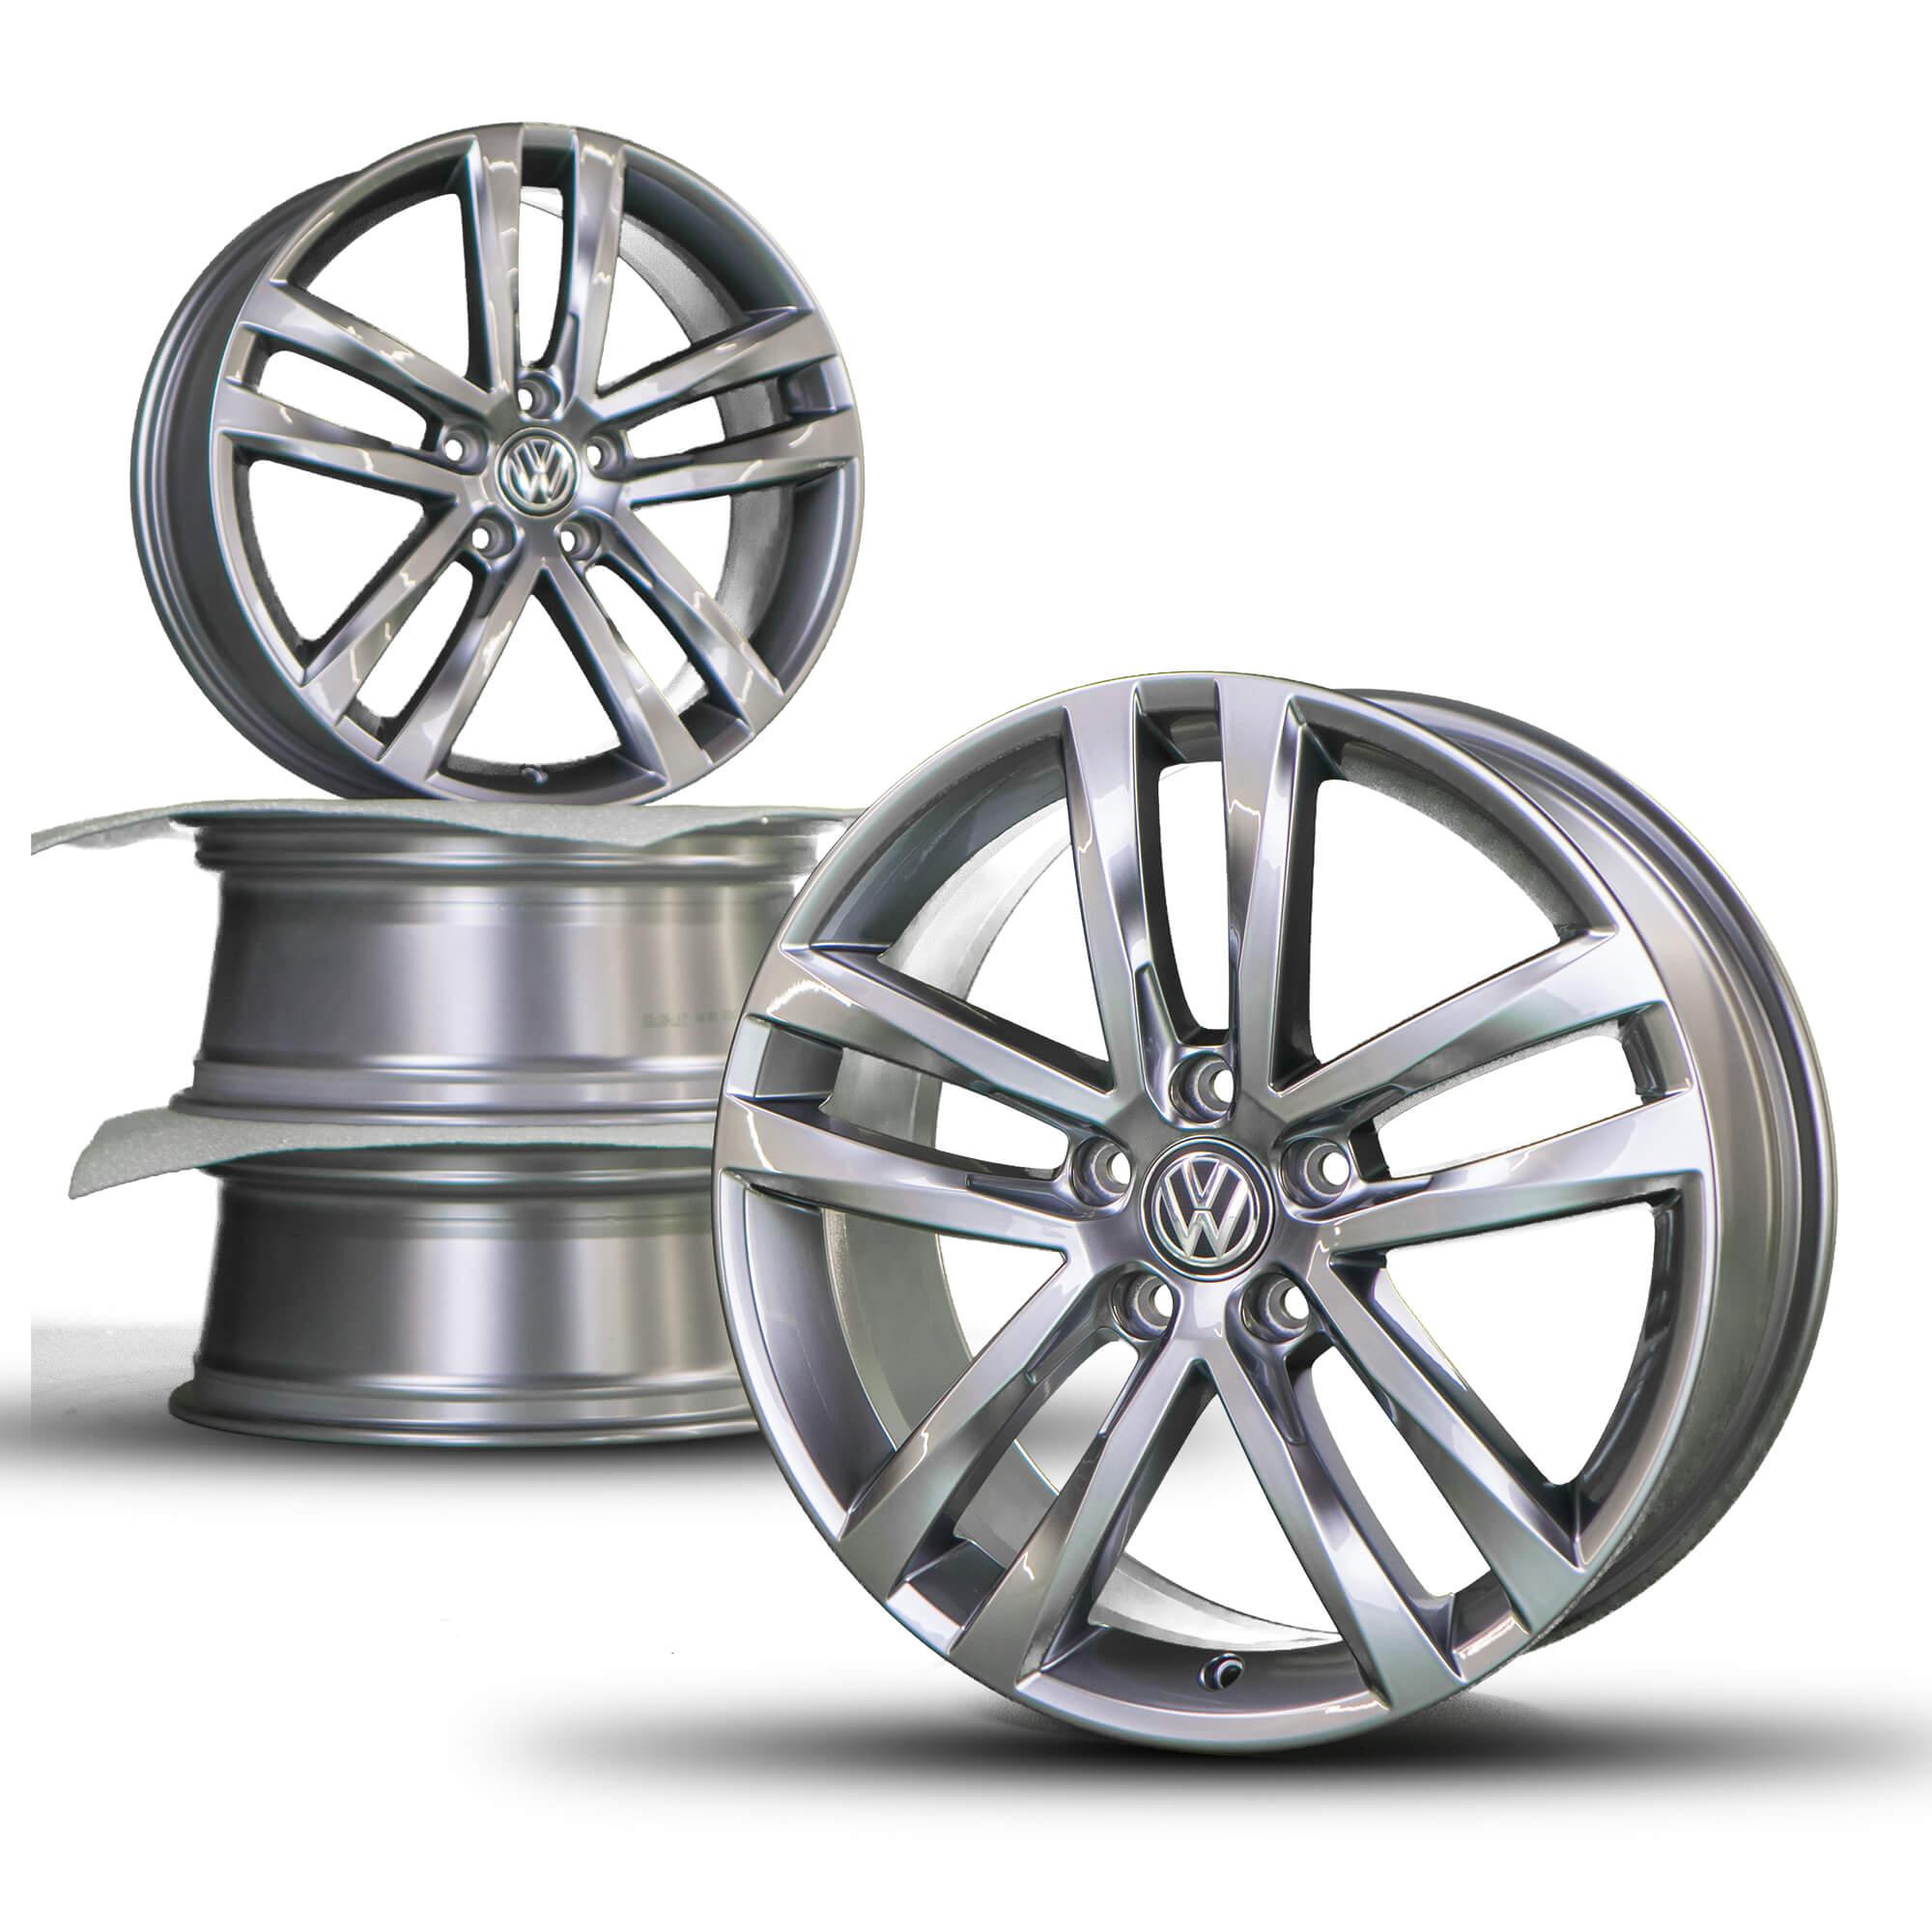 vw golf 5 6 7 18 inch alloy wheels rim r line gti gtd. Black Bedroom Furniture Sets. Home Design Ideas